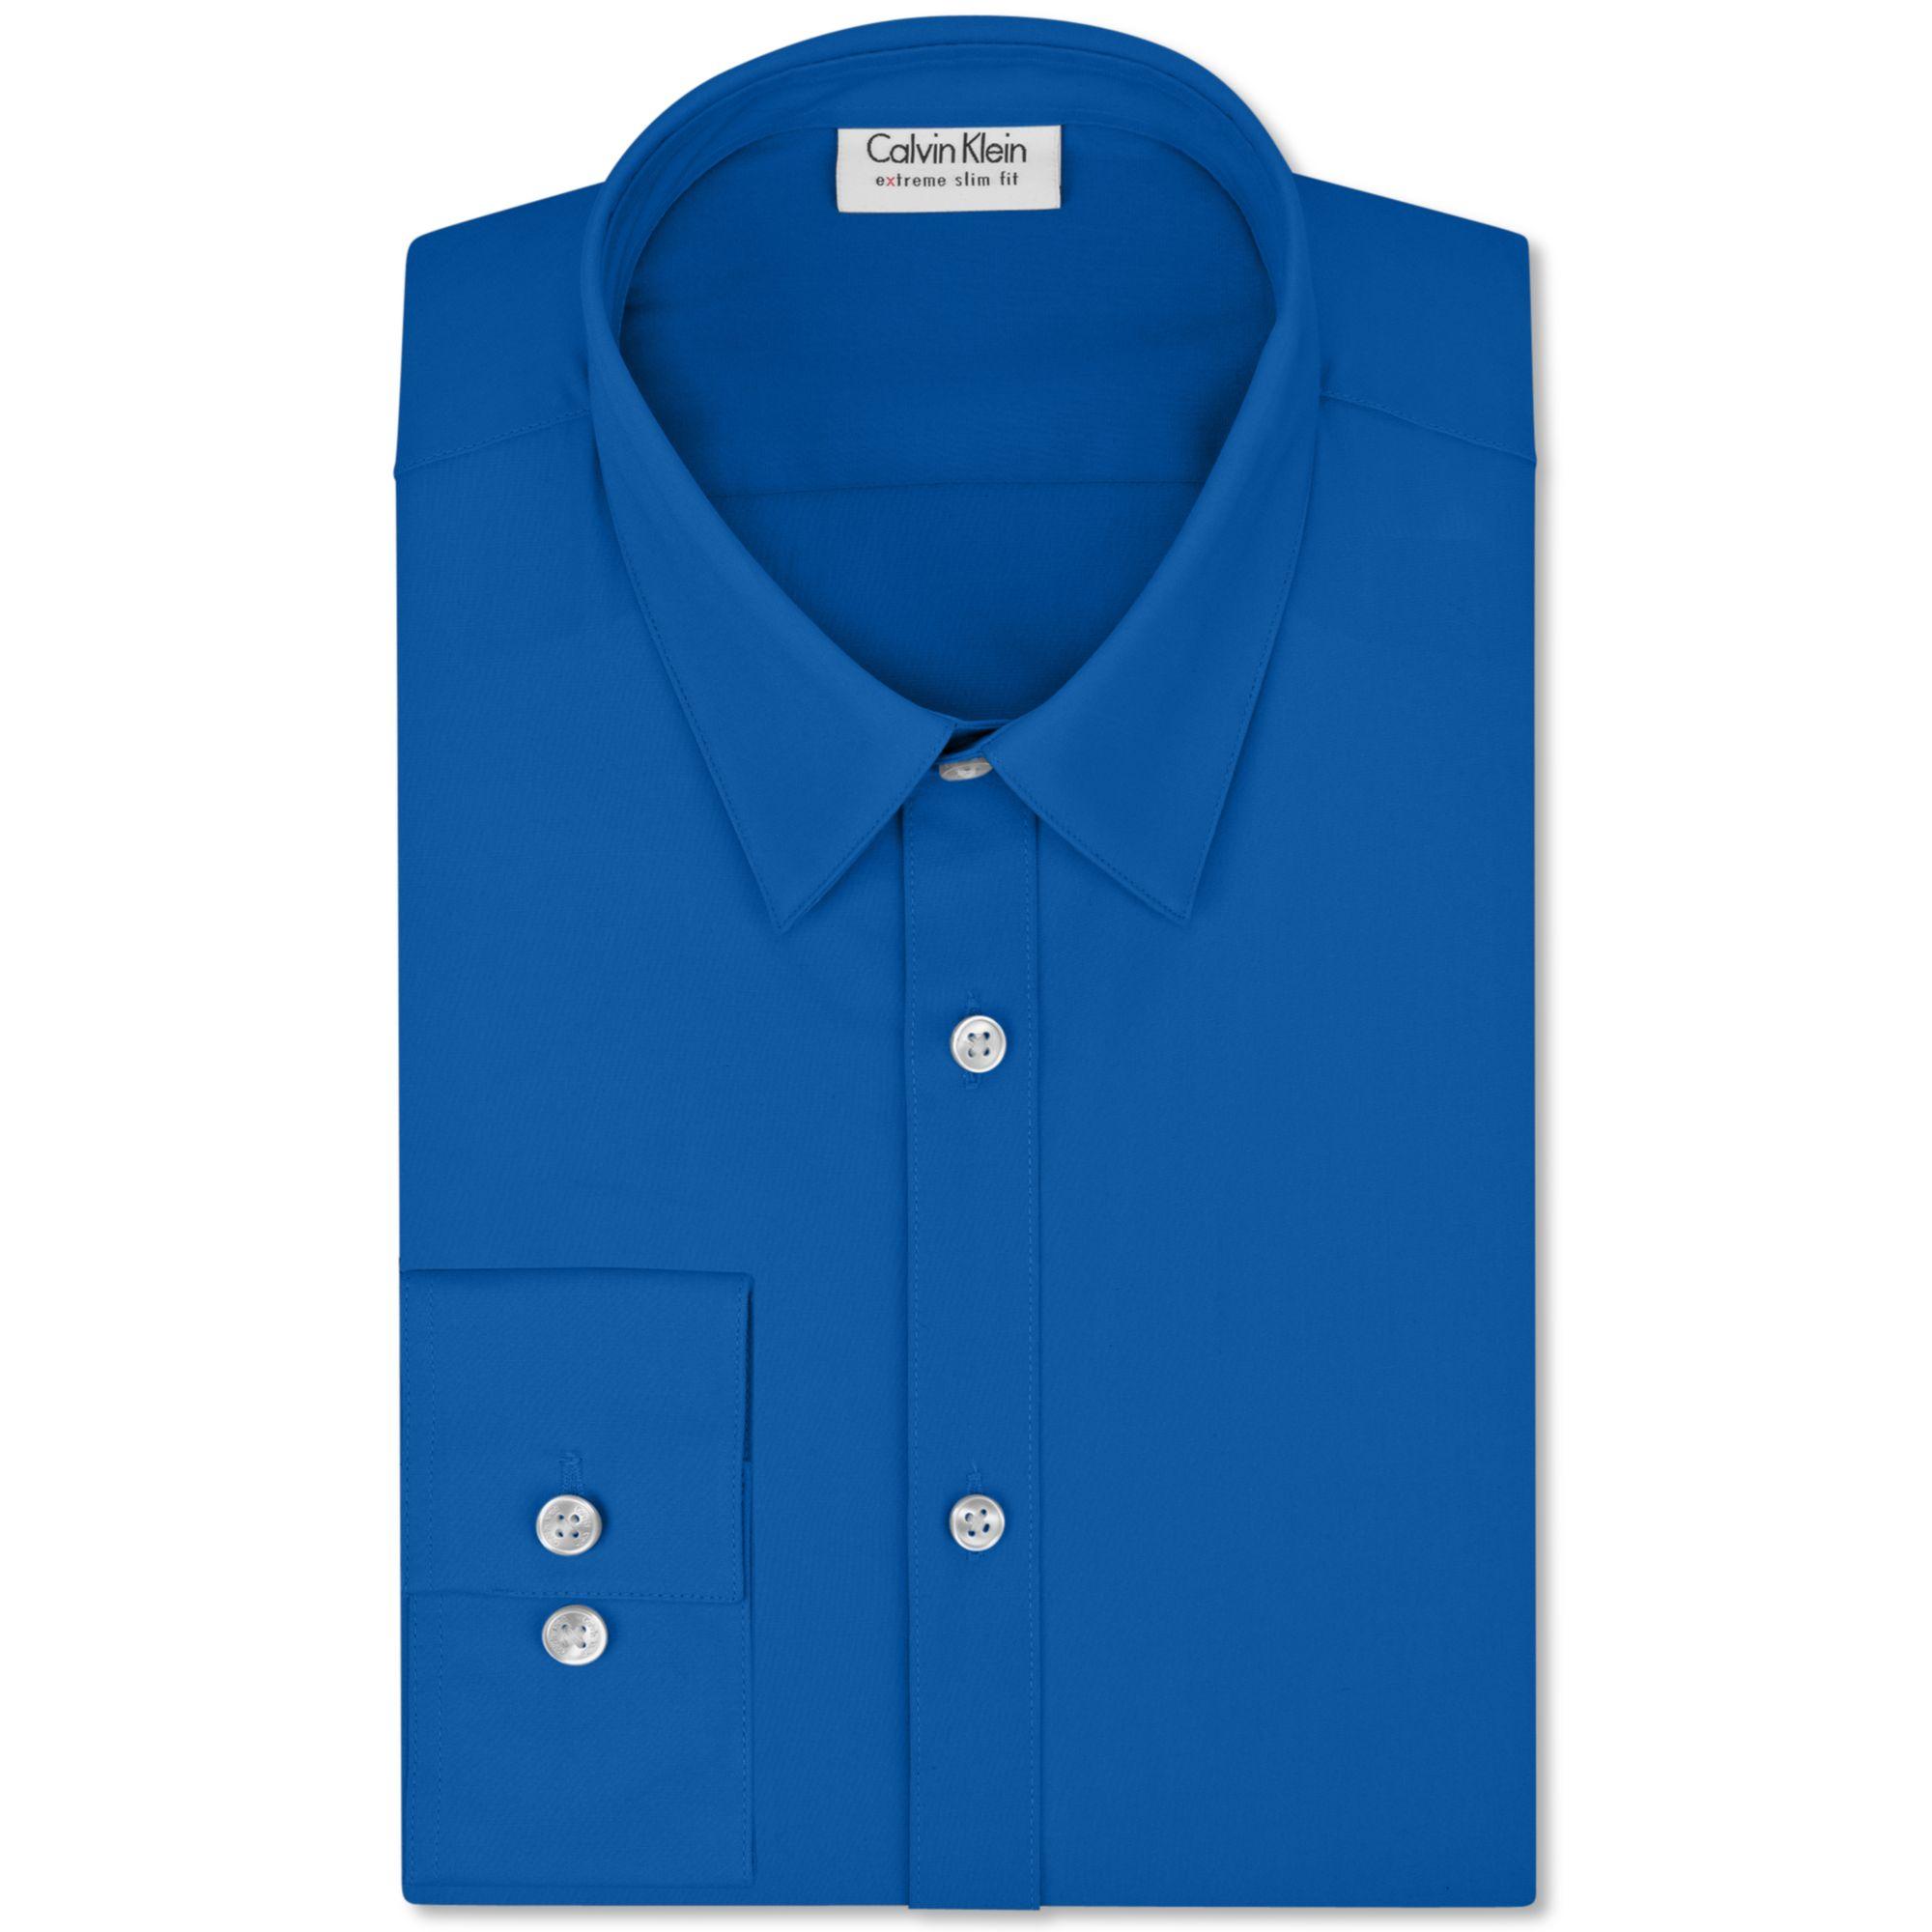 Calvin klein x extra slim fit solid dress shirt in blue for Men s extra slim fit dress shirts